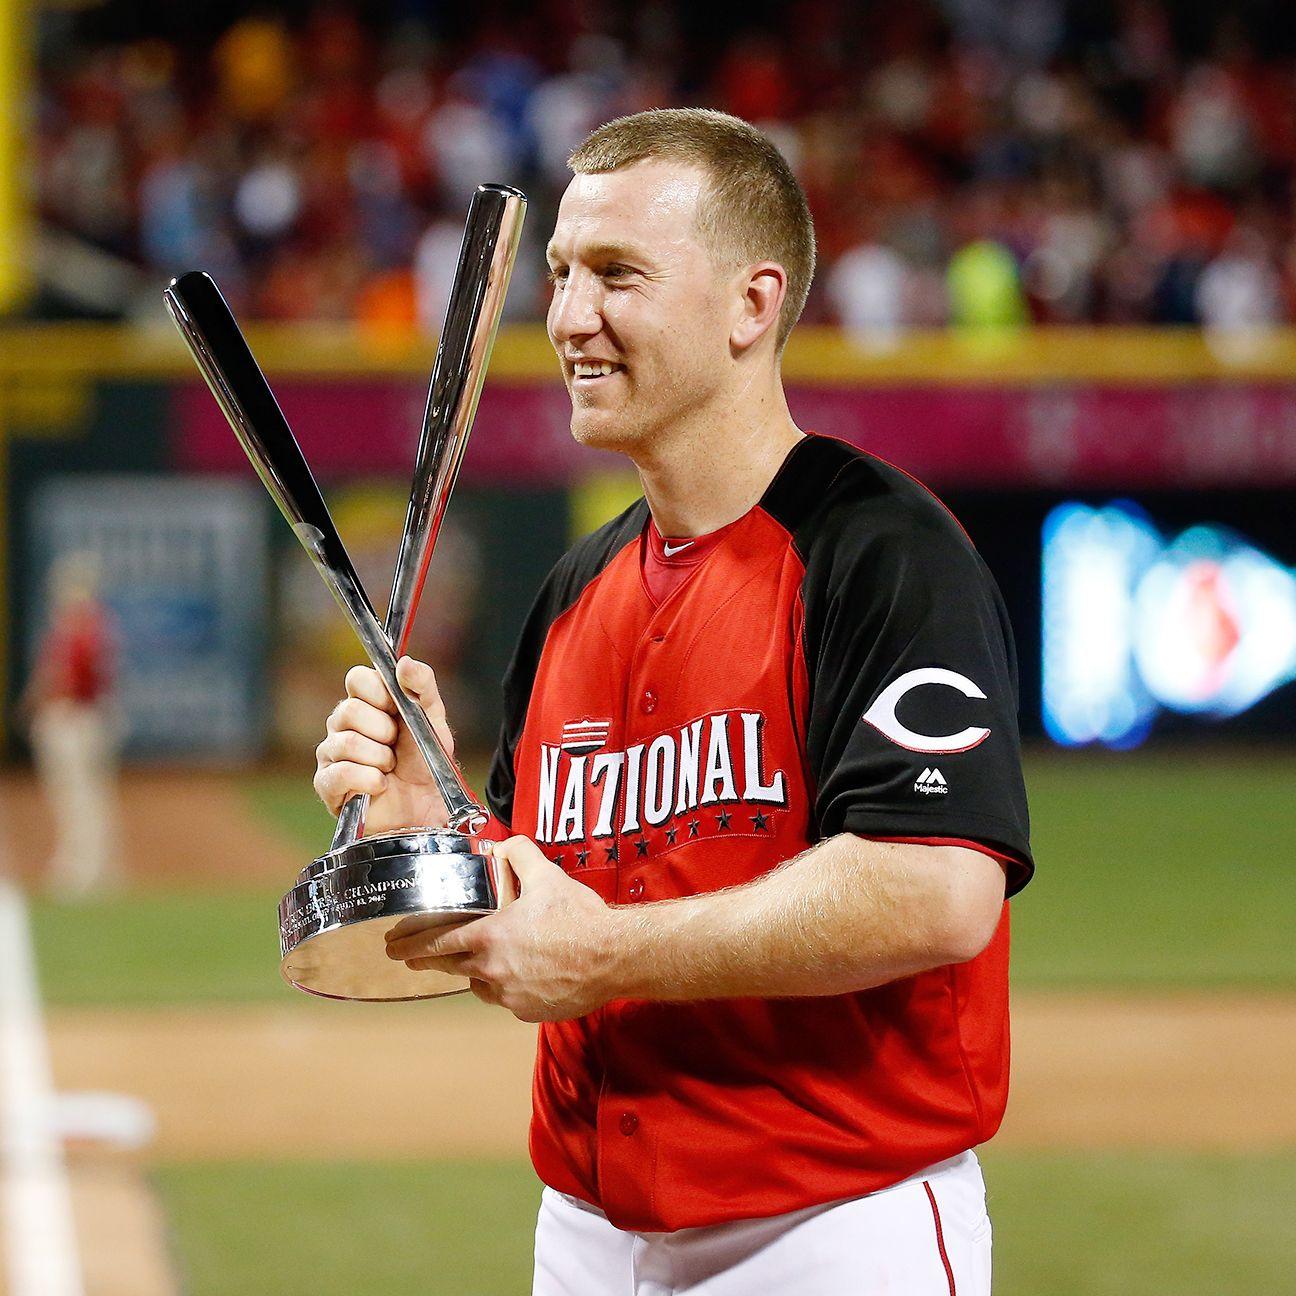 Cincinnati Reds star Todd Frazier wins Home Run Derby